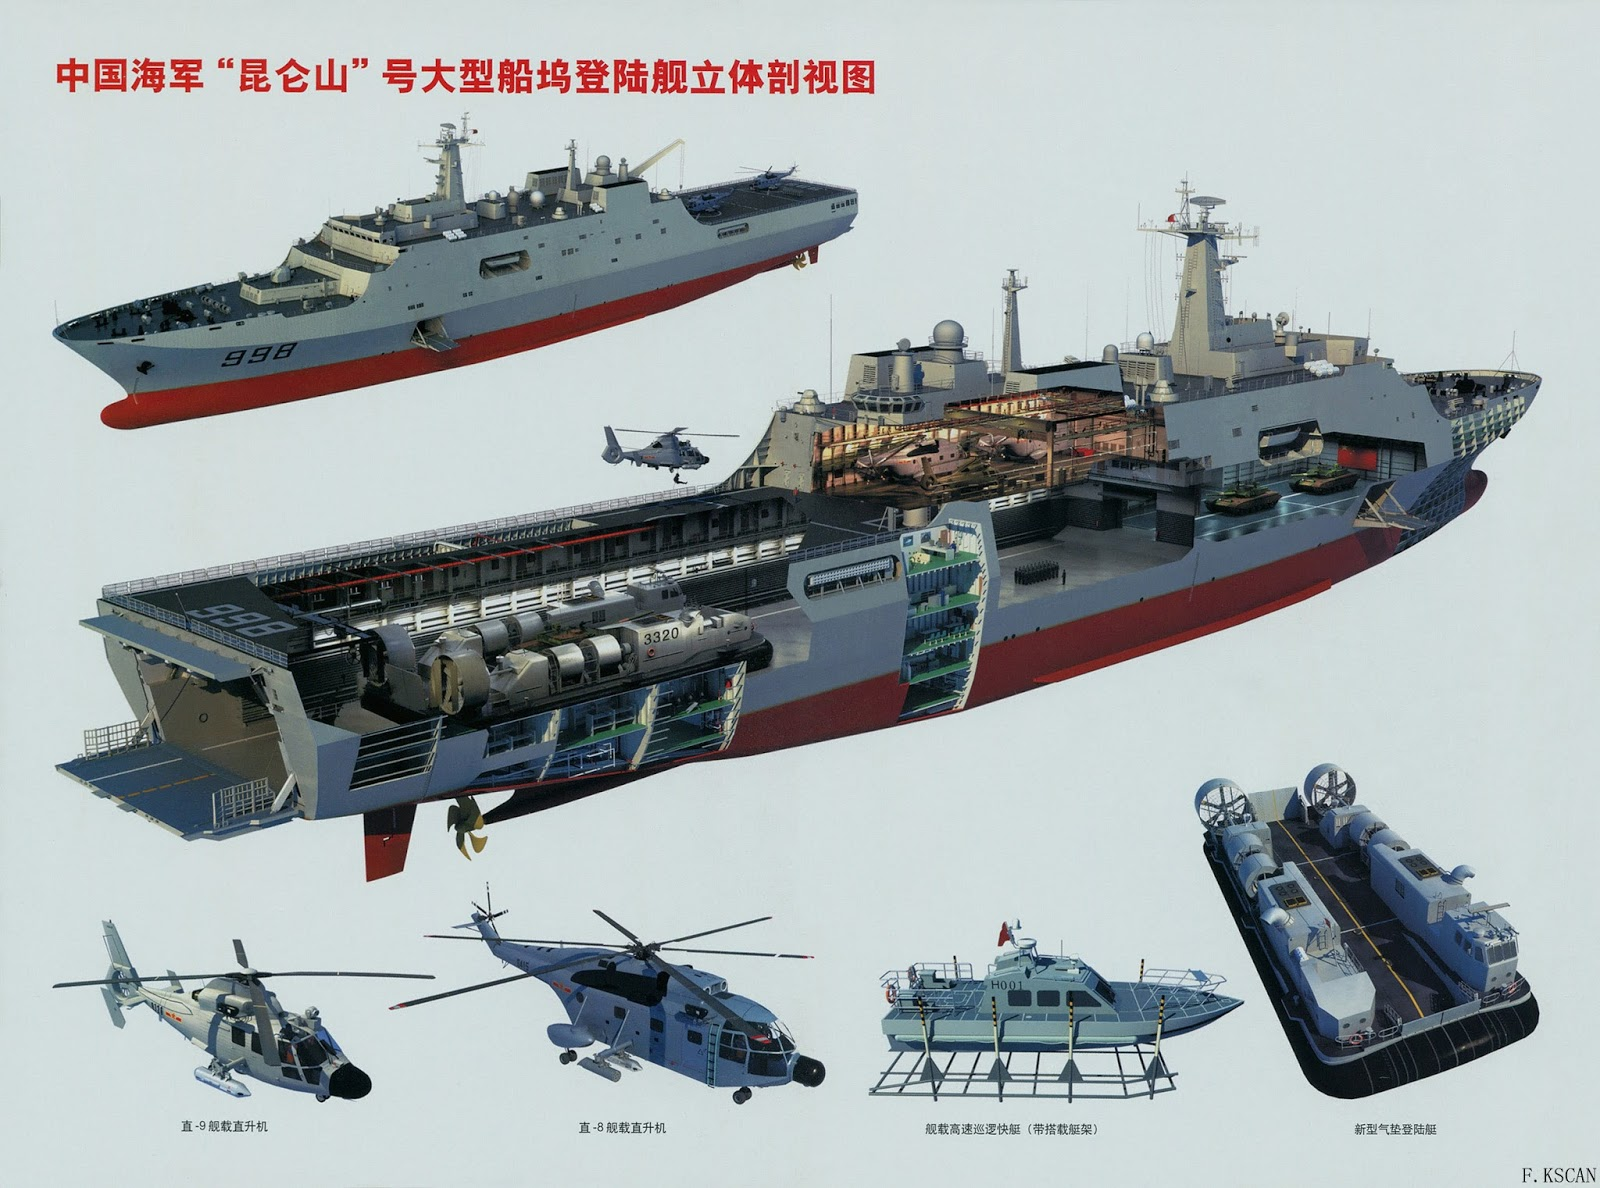 سفينه الانزال البرمائي فئة Type 071 Yuzhao-class الصينيه China+Type+071+amphibious+transport+dock%252C+or+landing+platform+dock+%2528LPD%2529++Type+071+%2528Yuzhao-class%2529+are+amphibious+warfare+ships+of+the+People%2527s+Republic+of+China%2527s+People%2527s+Liberation+Army+Navy+%25281%2529